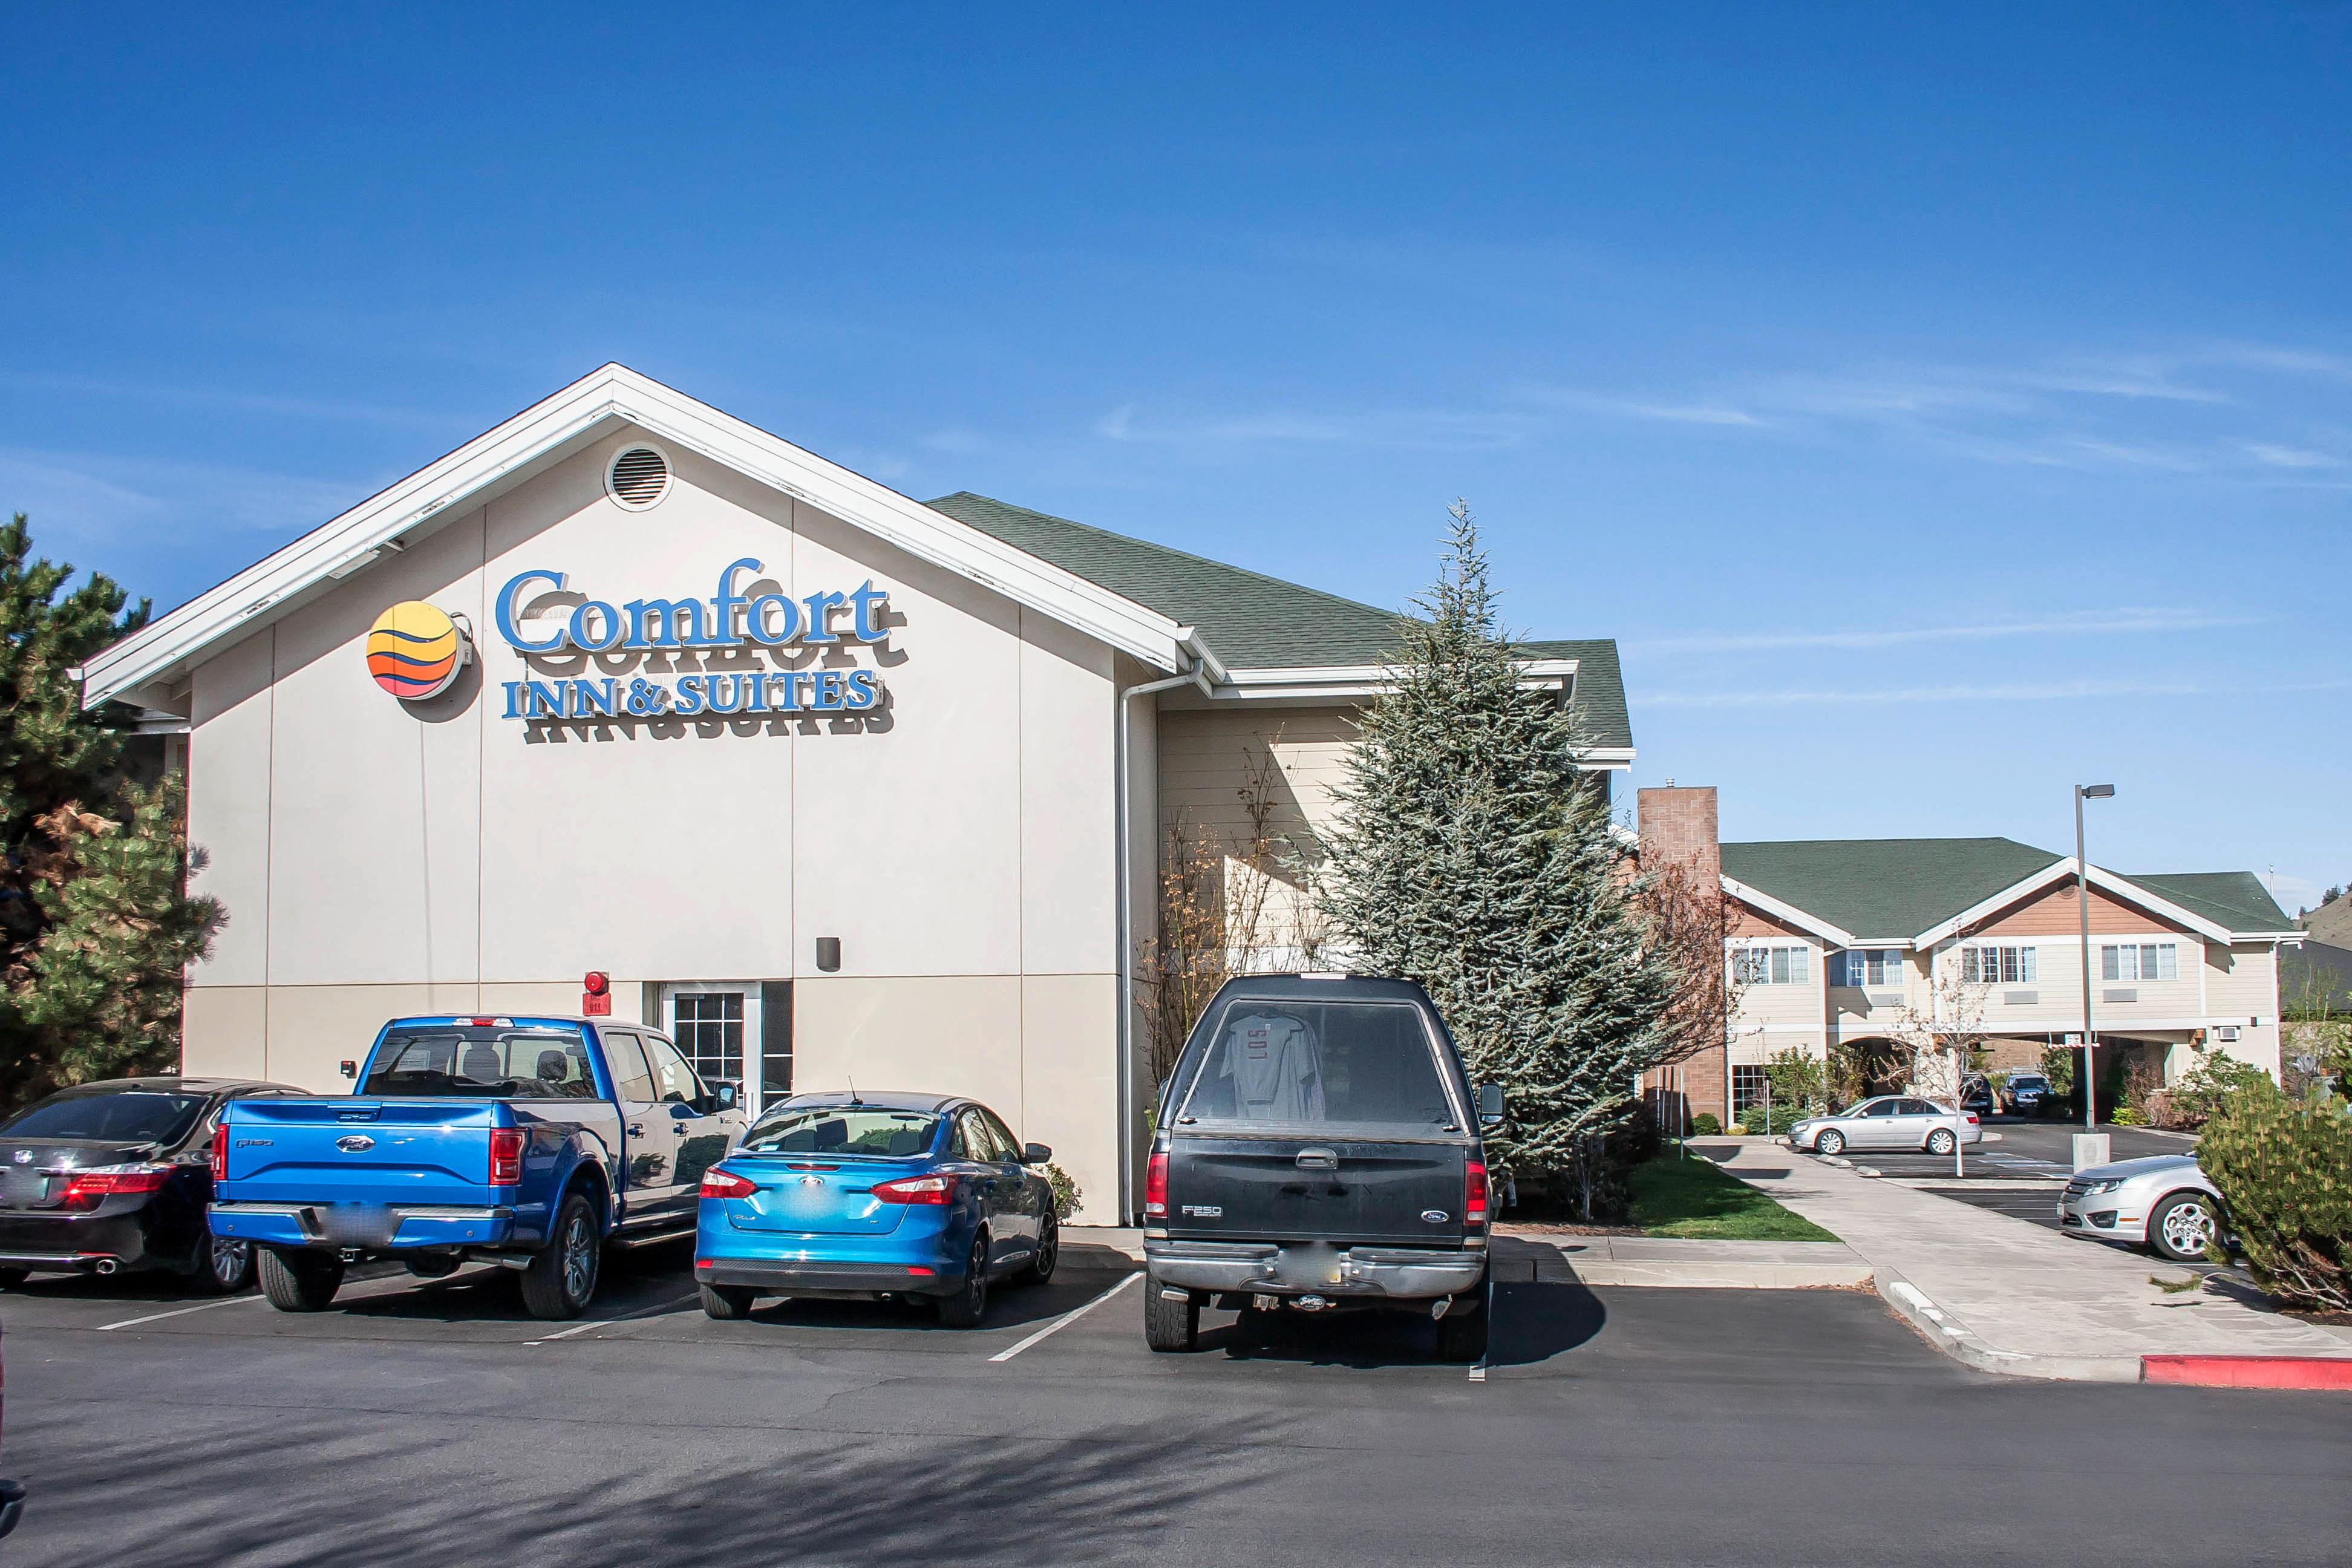 Hotel in OR Bend 97701 Comfort Inn & Suites 62065 SE 27th Street  (541)617-9696